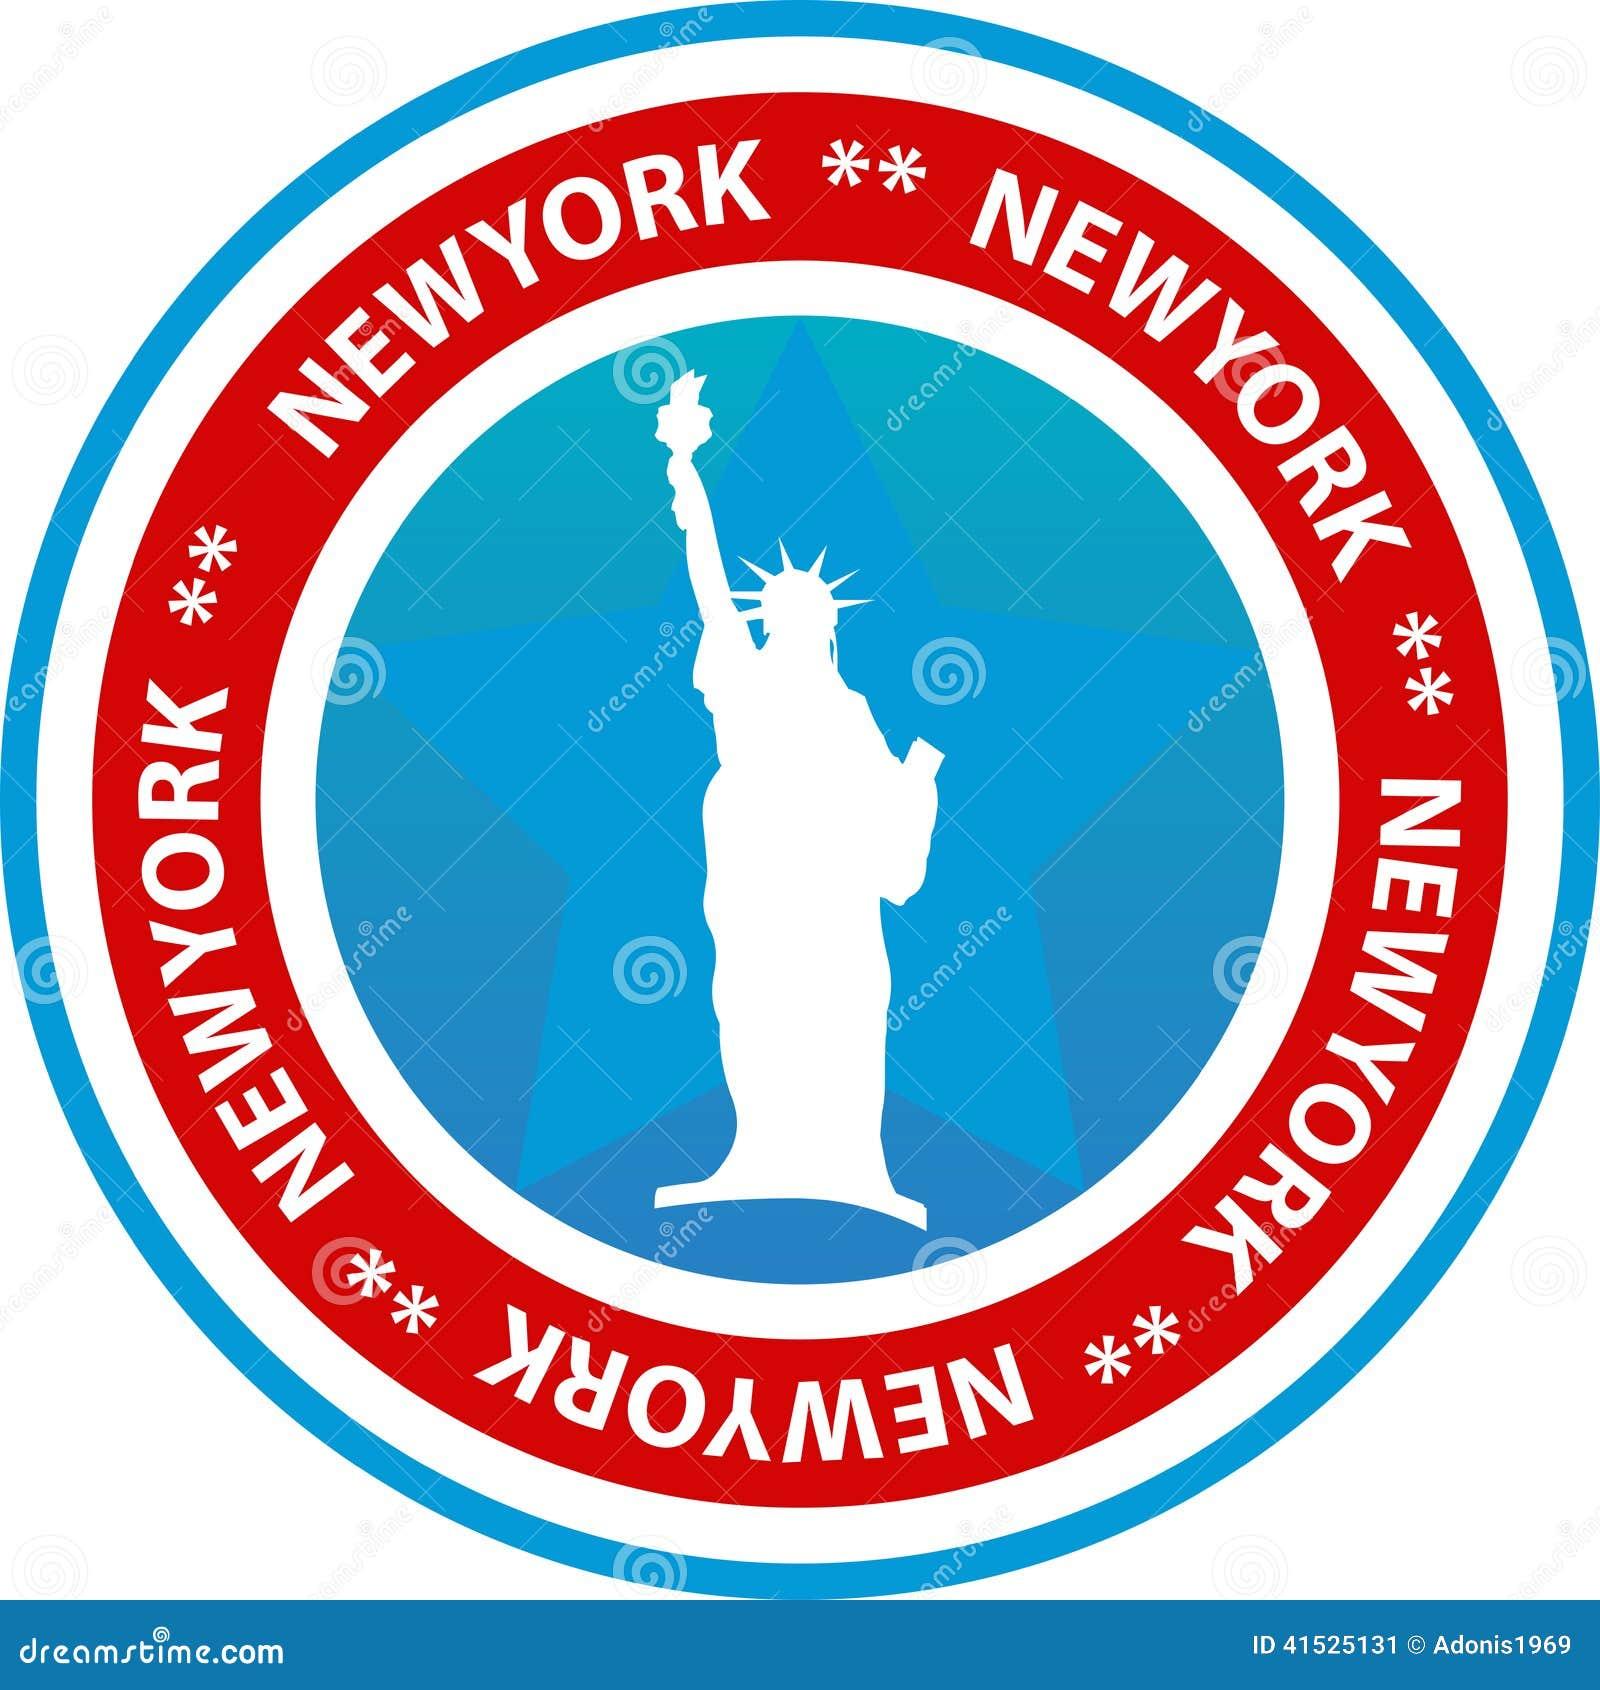 New York Seal Or Button Stock Vector - Image: 41525131